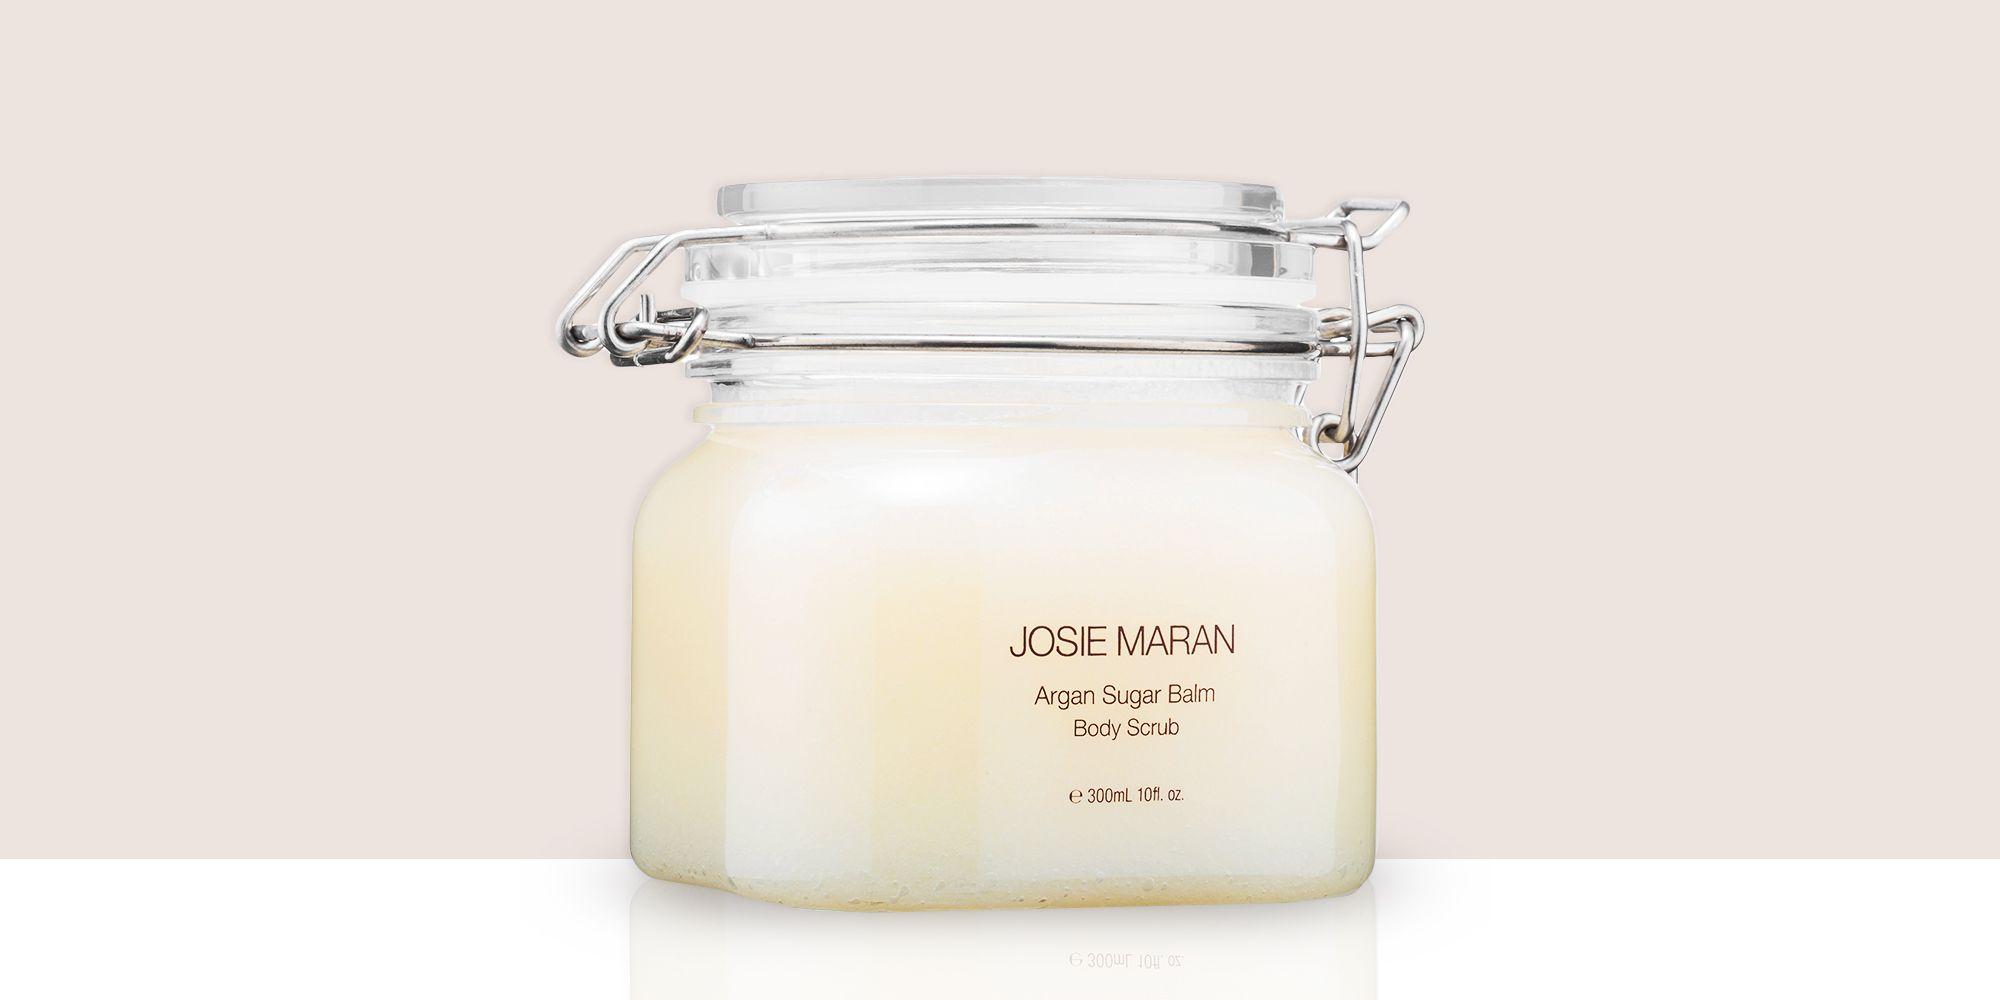 10 Best Sugar Scrubs 2018 Nourishing For Face And Body Aromatherapy Lavender Vanilla Scrub